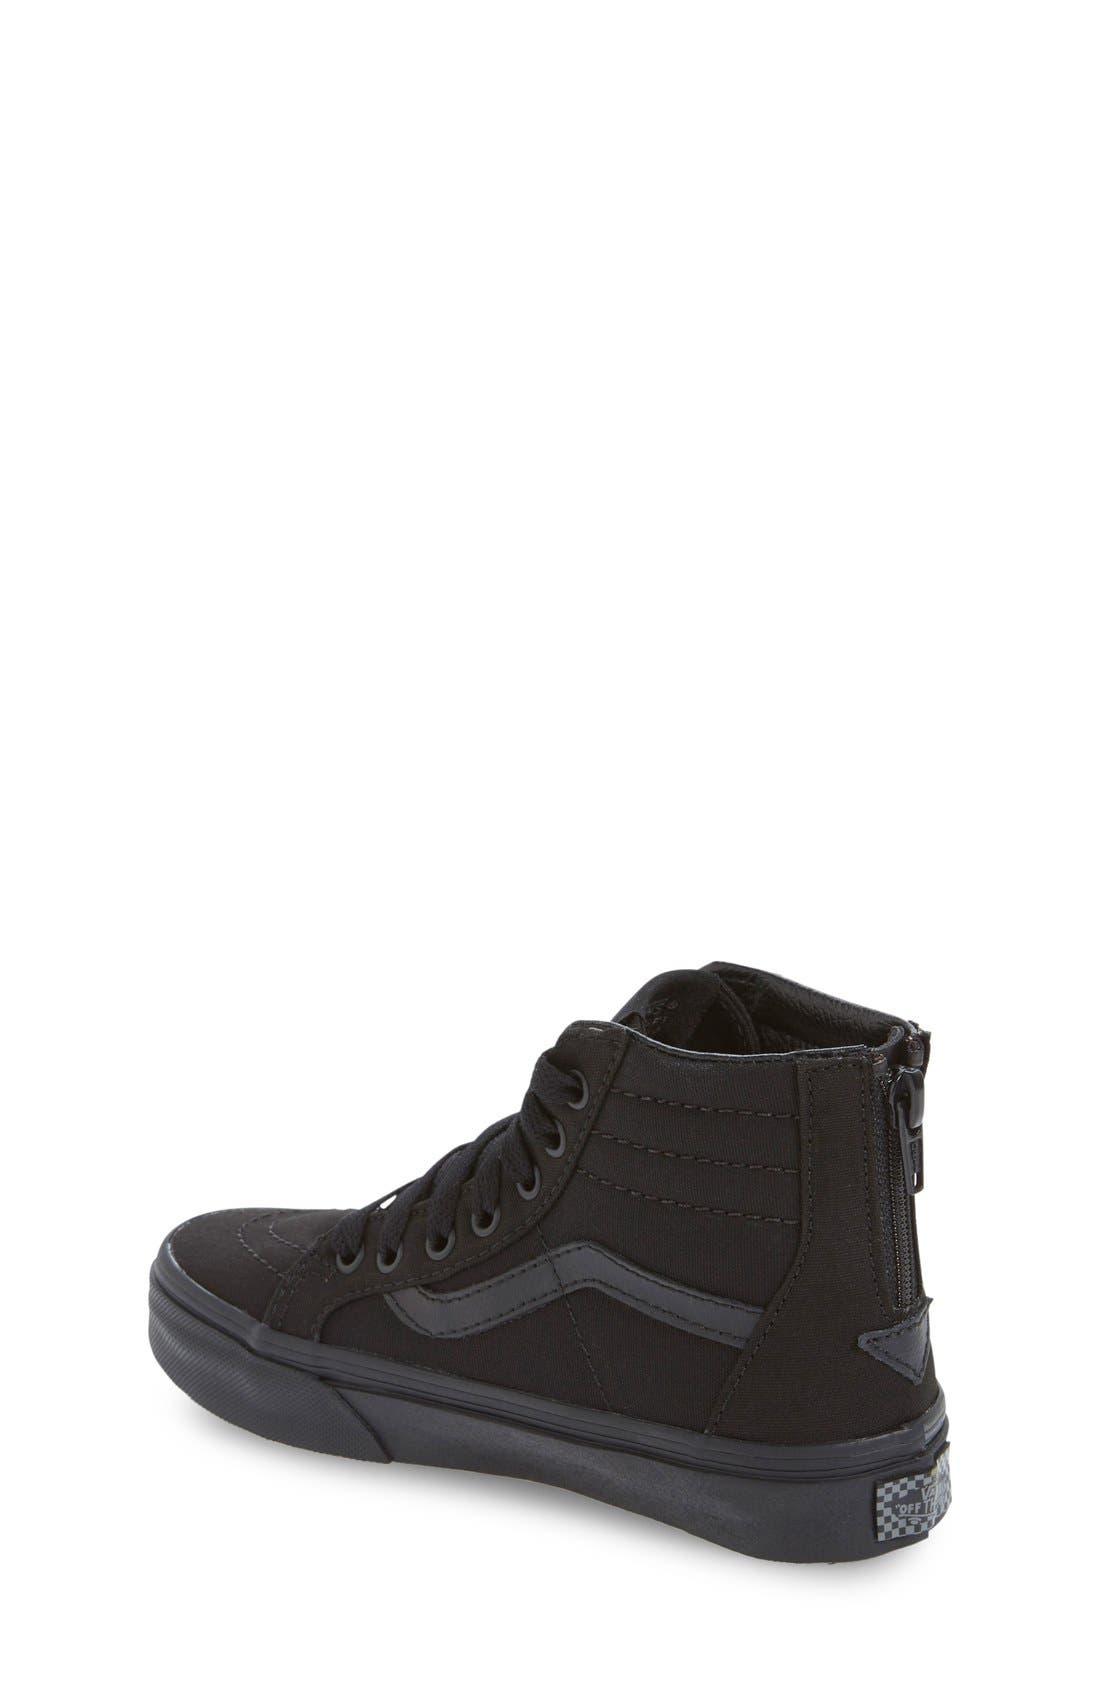 'Sk8-Hi' Zip Sneaker,                             Alternate thumbnail 3, color,                             BLACK /BLACK CHECK